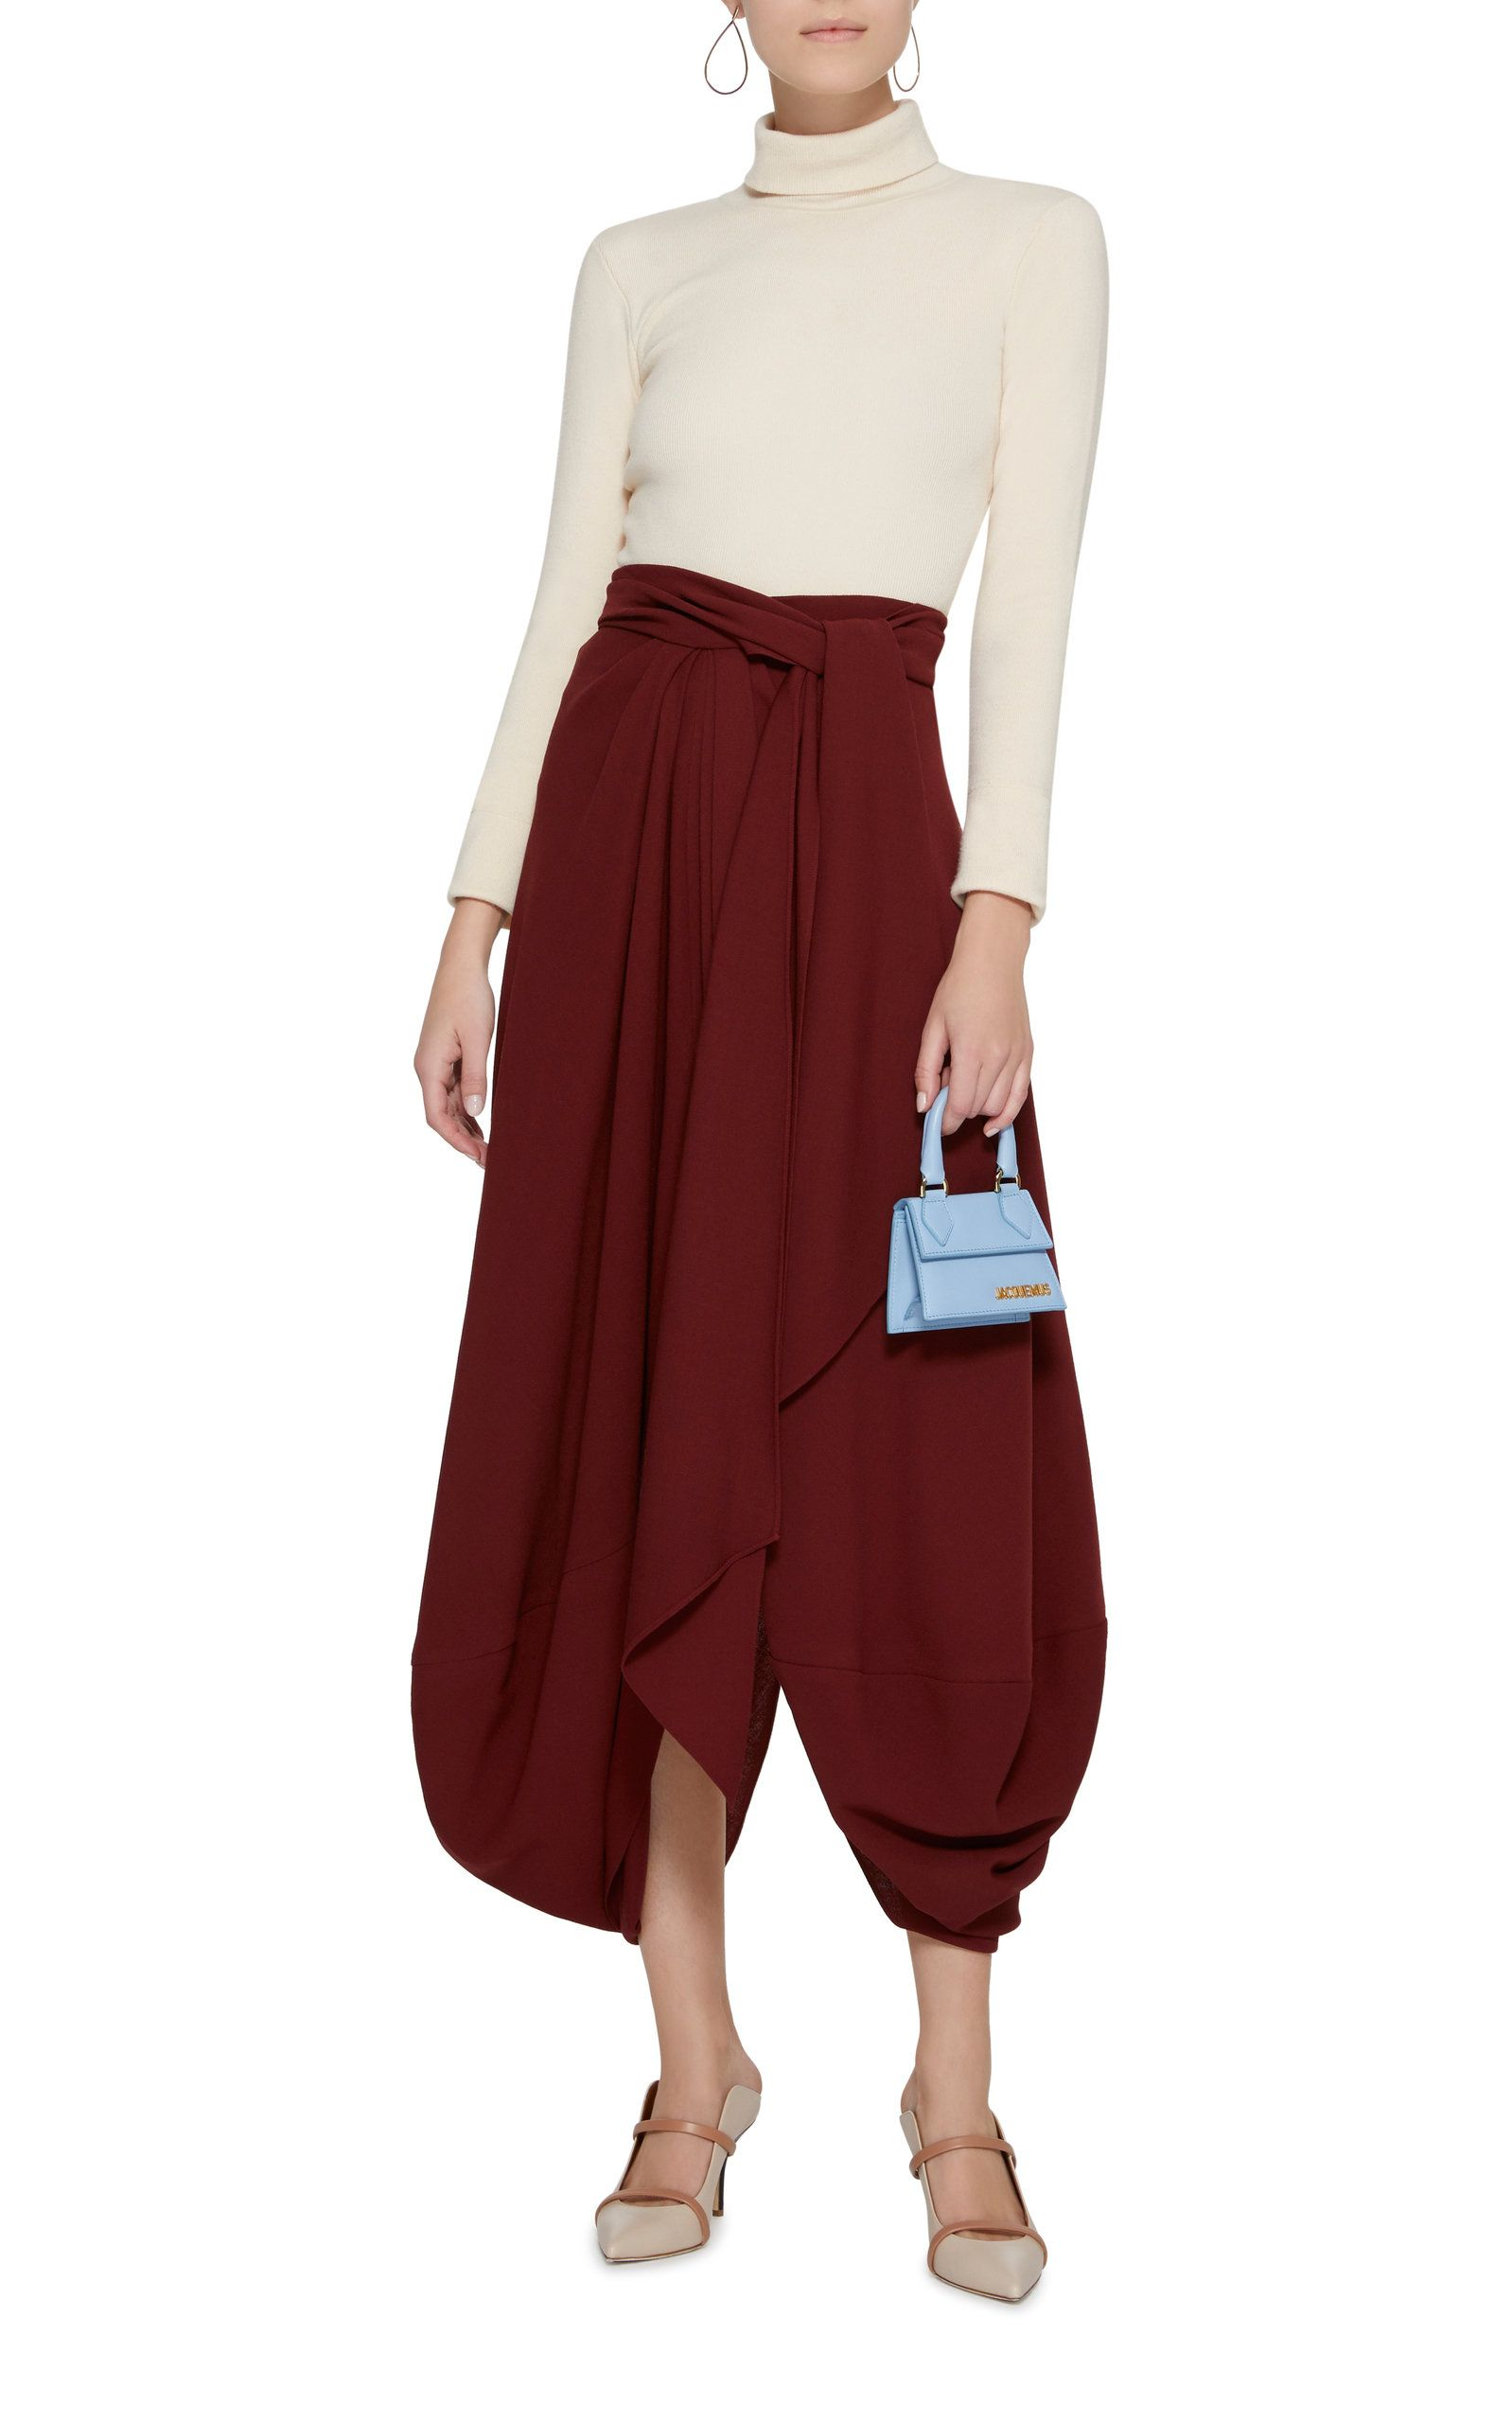 0c3ca2f22 Souela Draped Wool Midi Skirt by JACQUEMUS Now Available on Moda Operandi